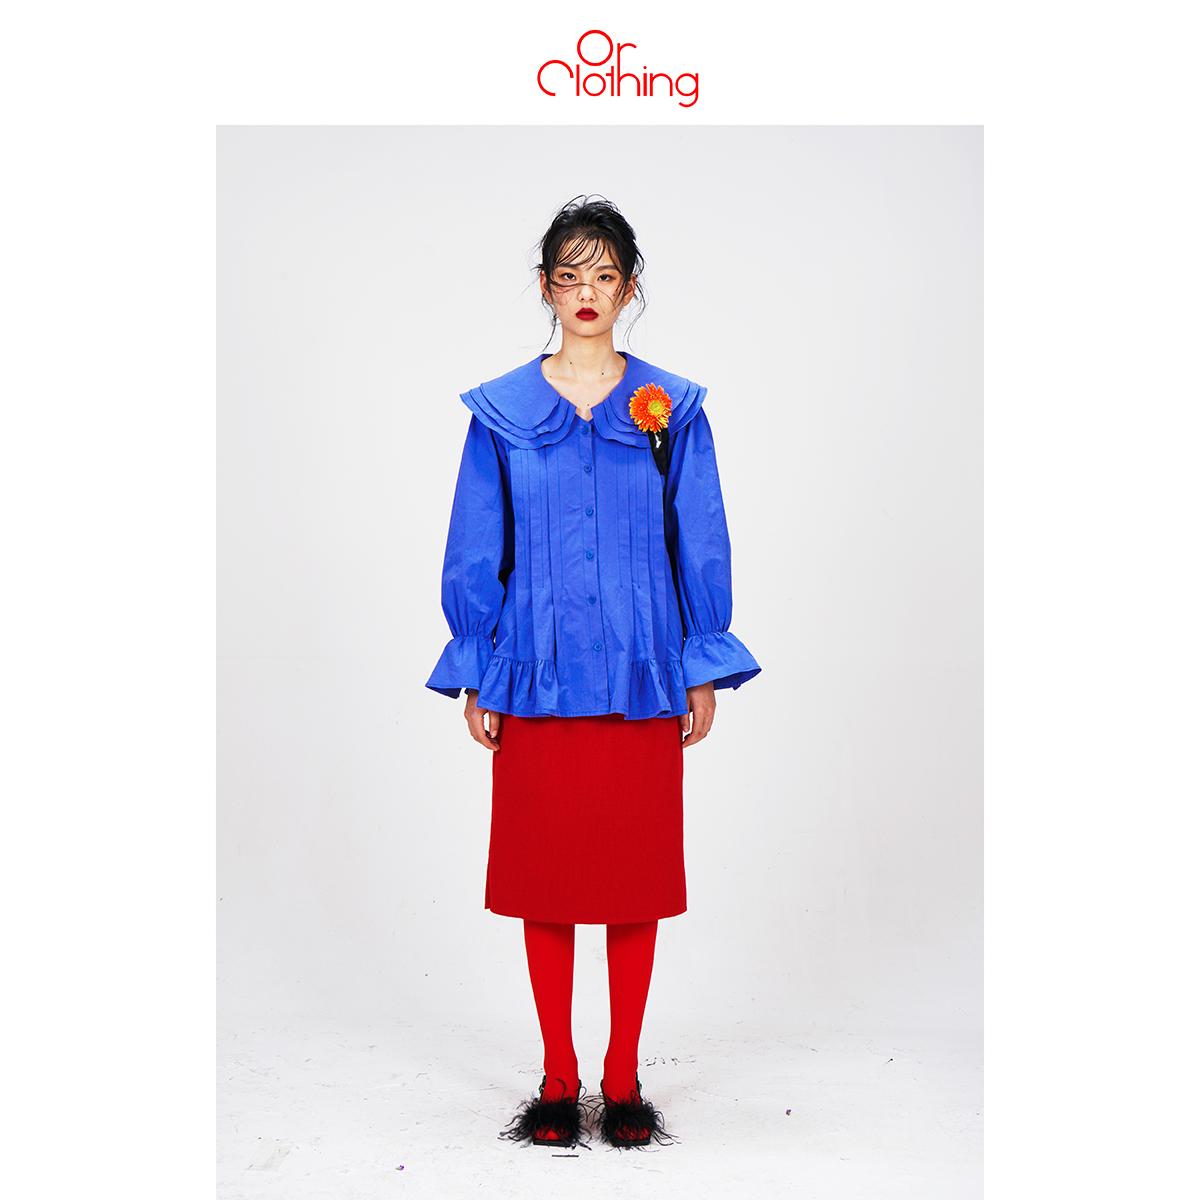 Or Clothing | 原创自制 复古宽松大翻领花瓣袖单排扣百搭衬衣 女